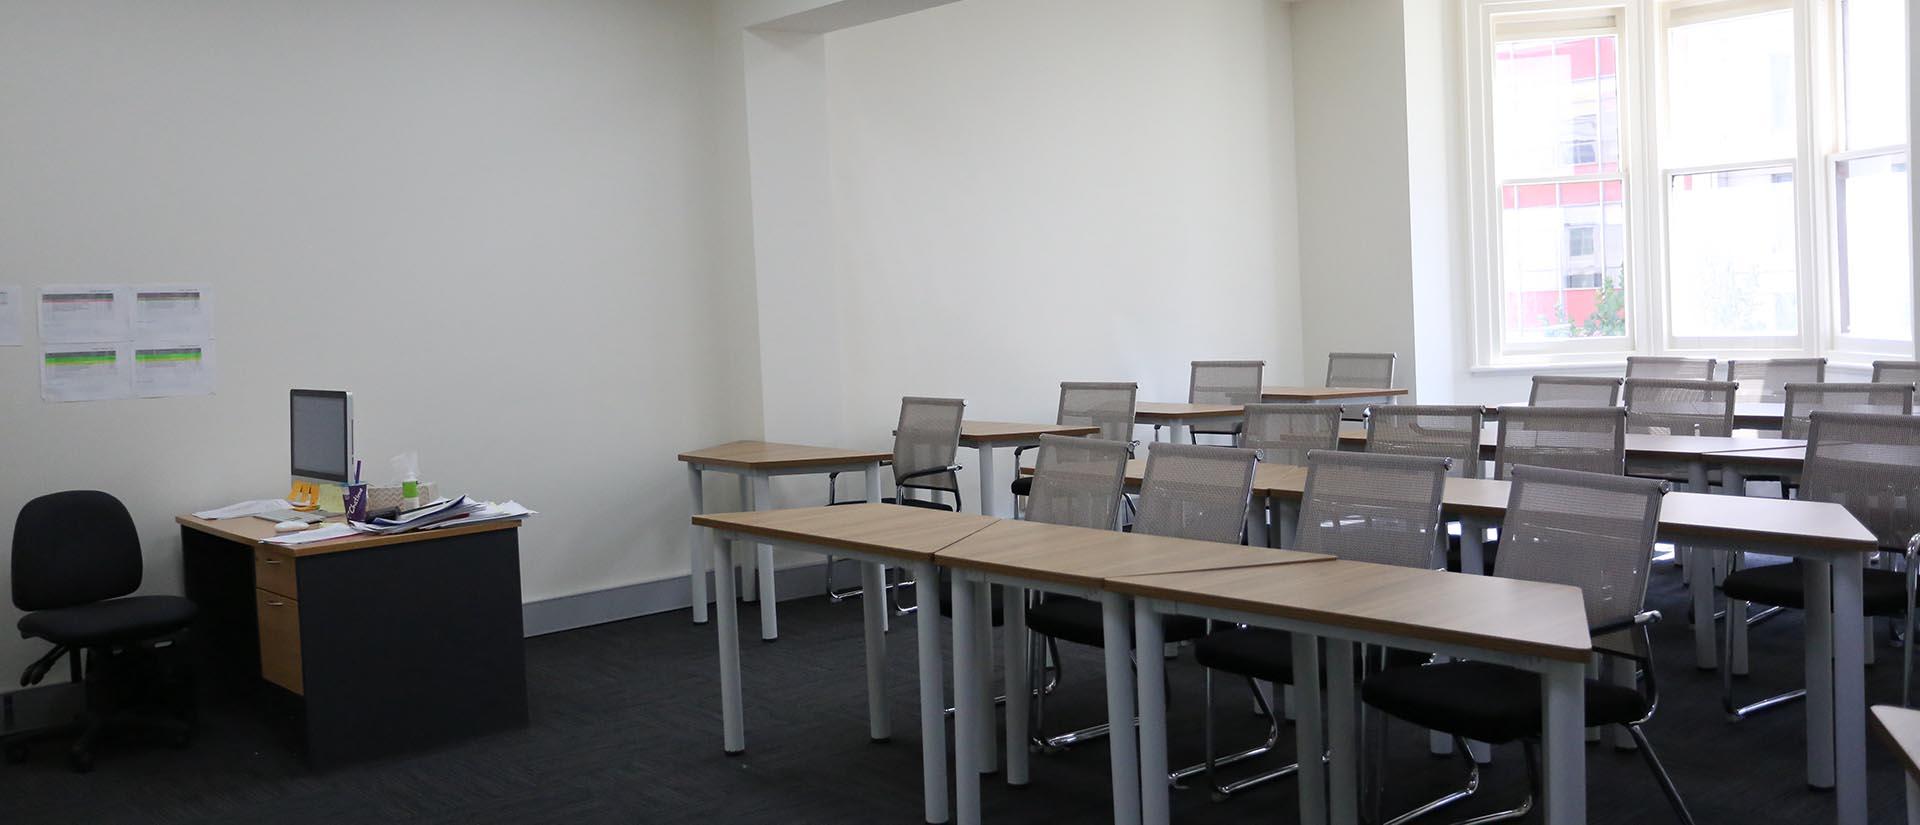 Projects-Office&Institute_ITIA & ZARAH 1